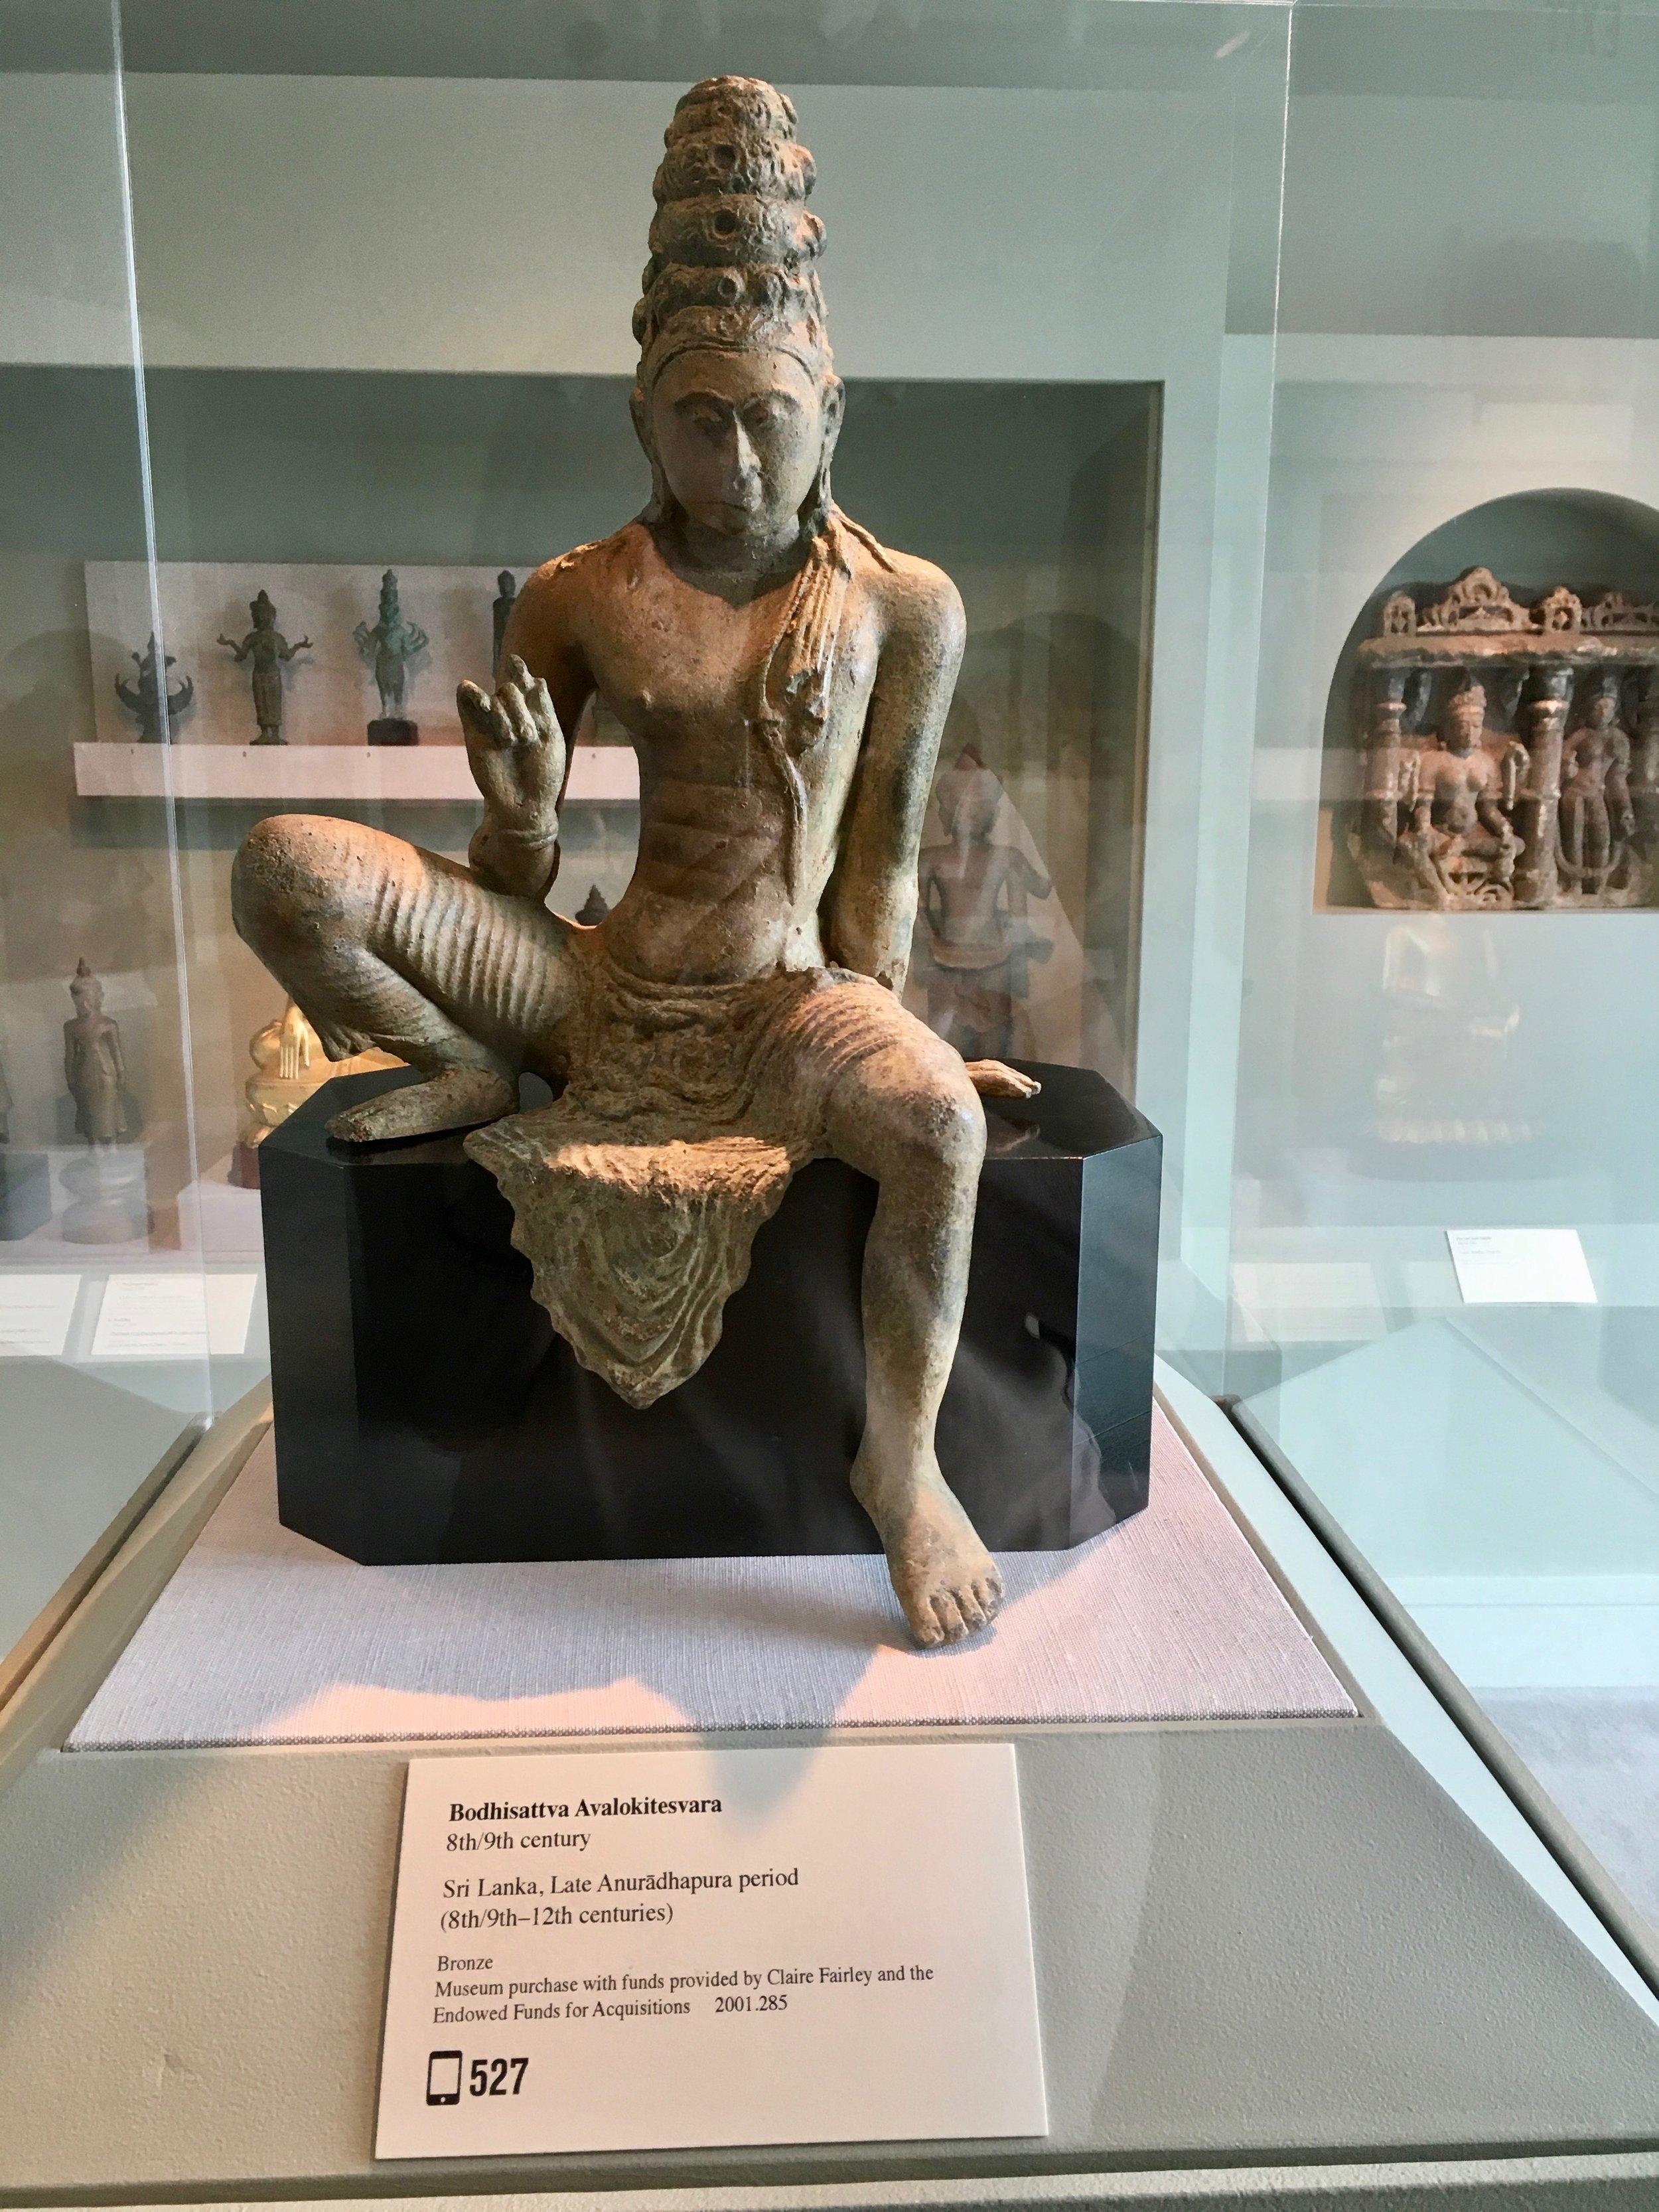 Bodhisattva of Great Compassion